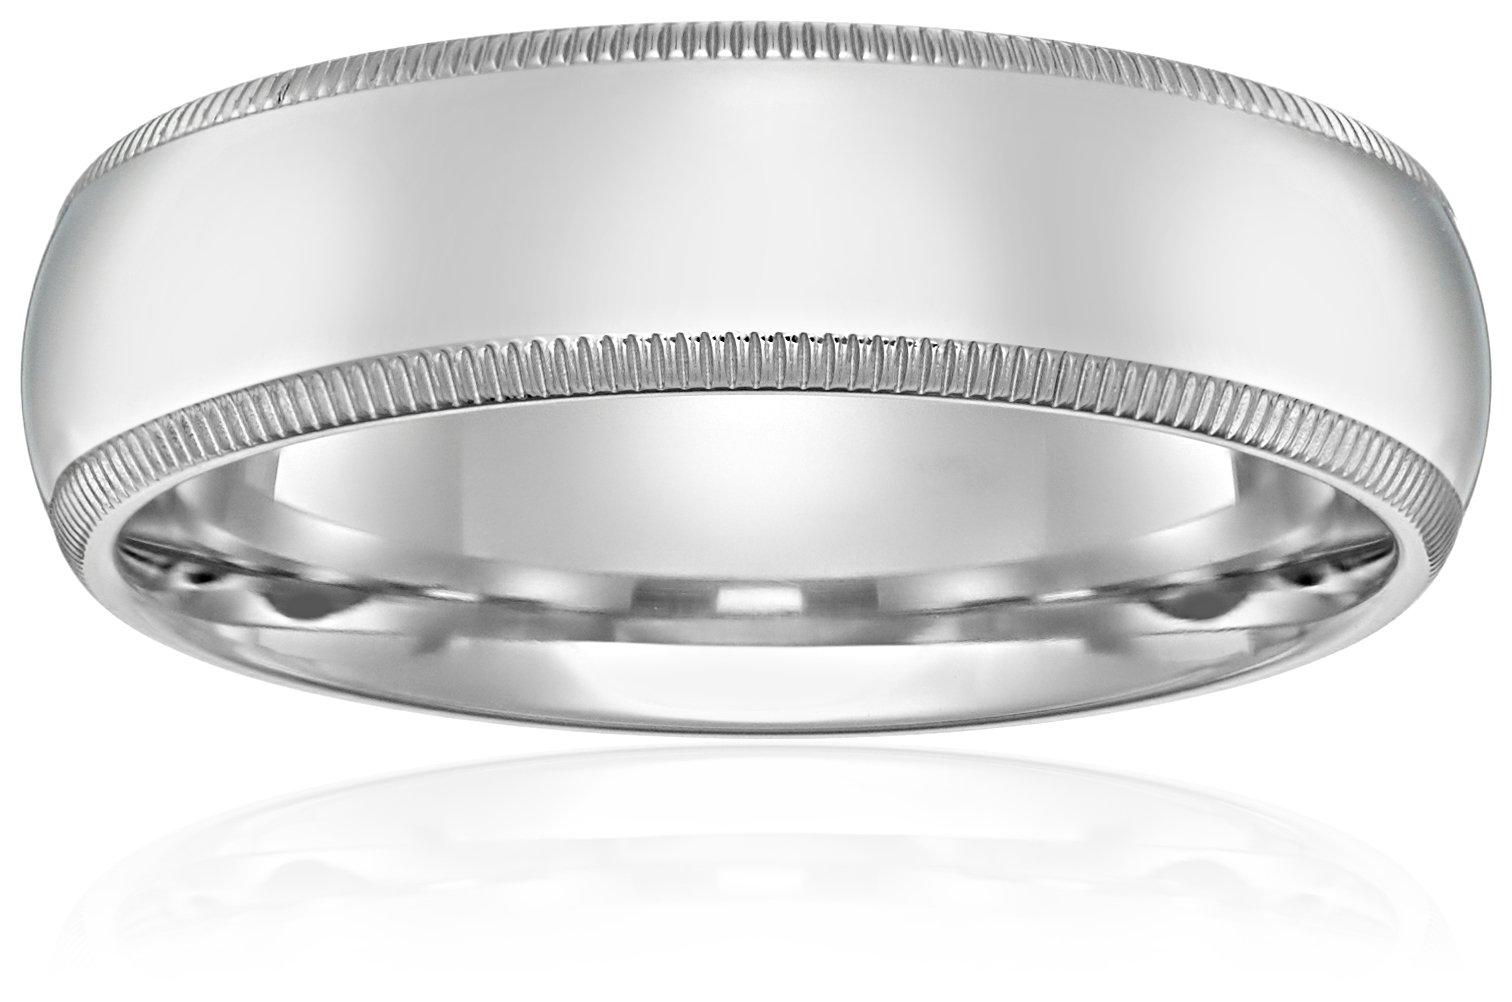 Standard Comfort-Fit 10K White Gold Milgrain Band, 6mm, Size 8.5